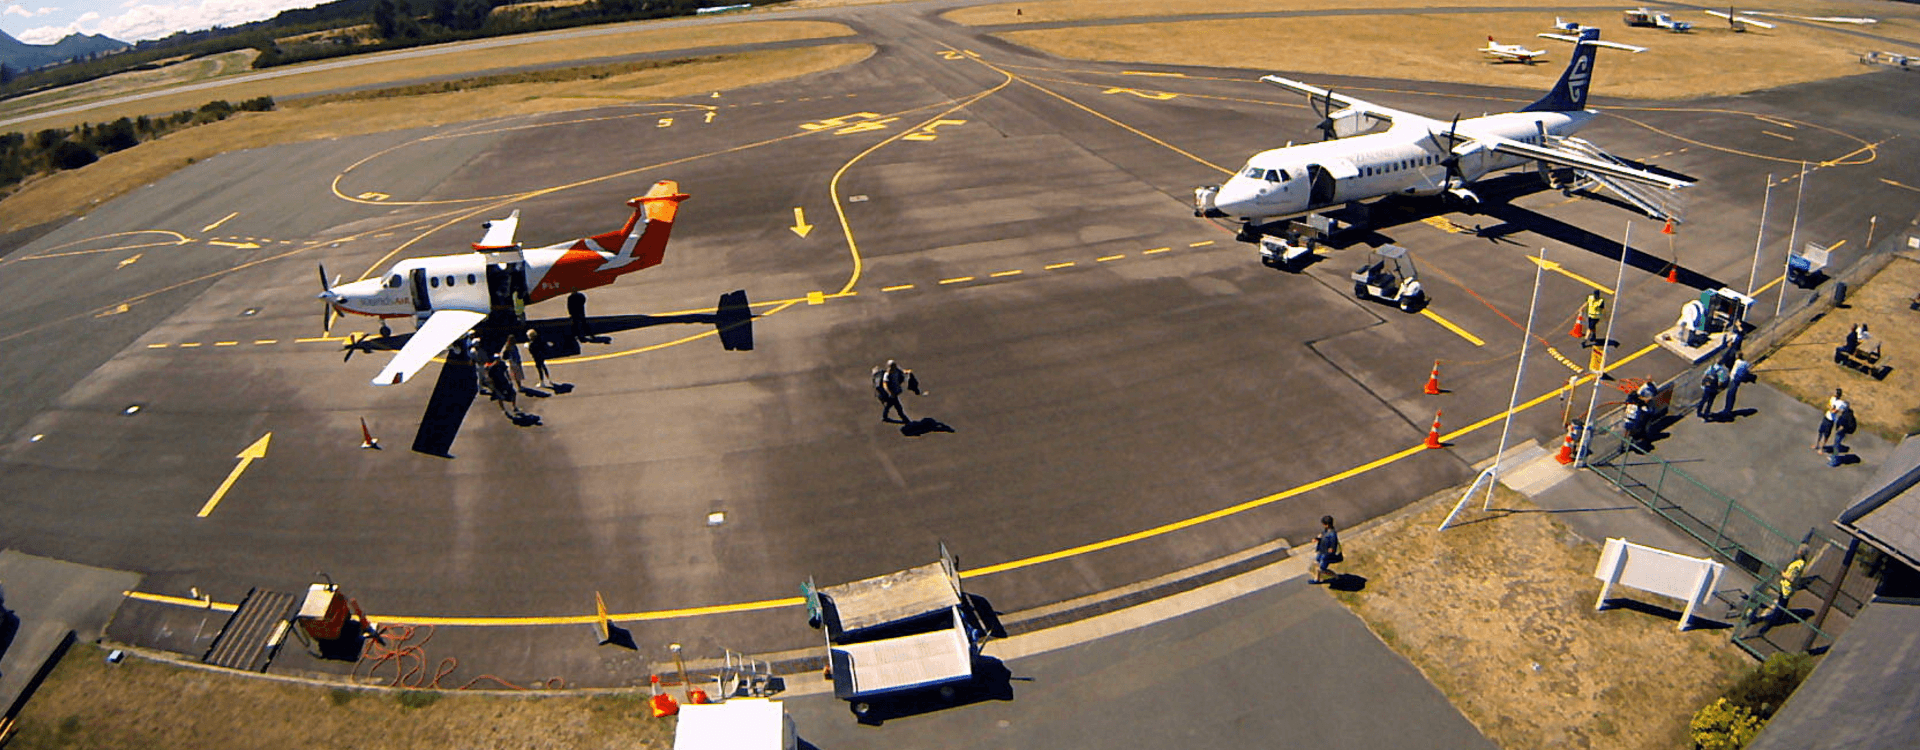 WAIKATO - Taupō Airport brings tourists and business to the Waikato region